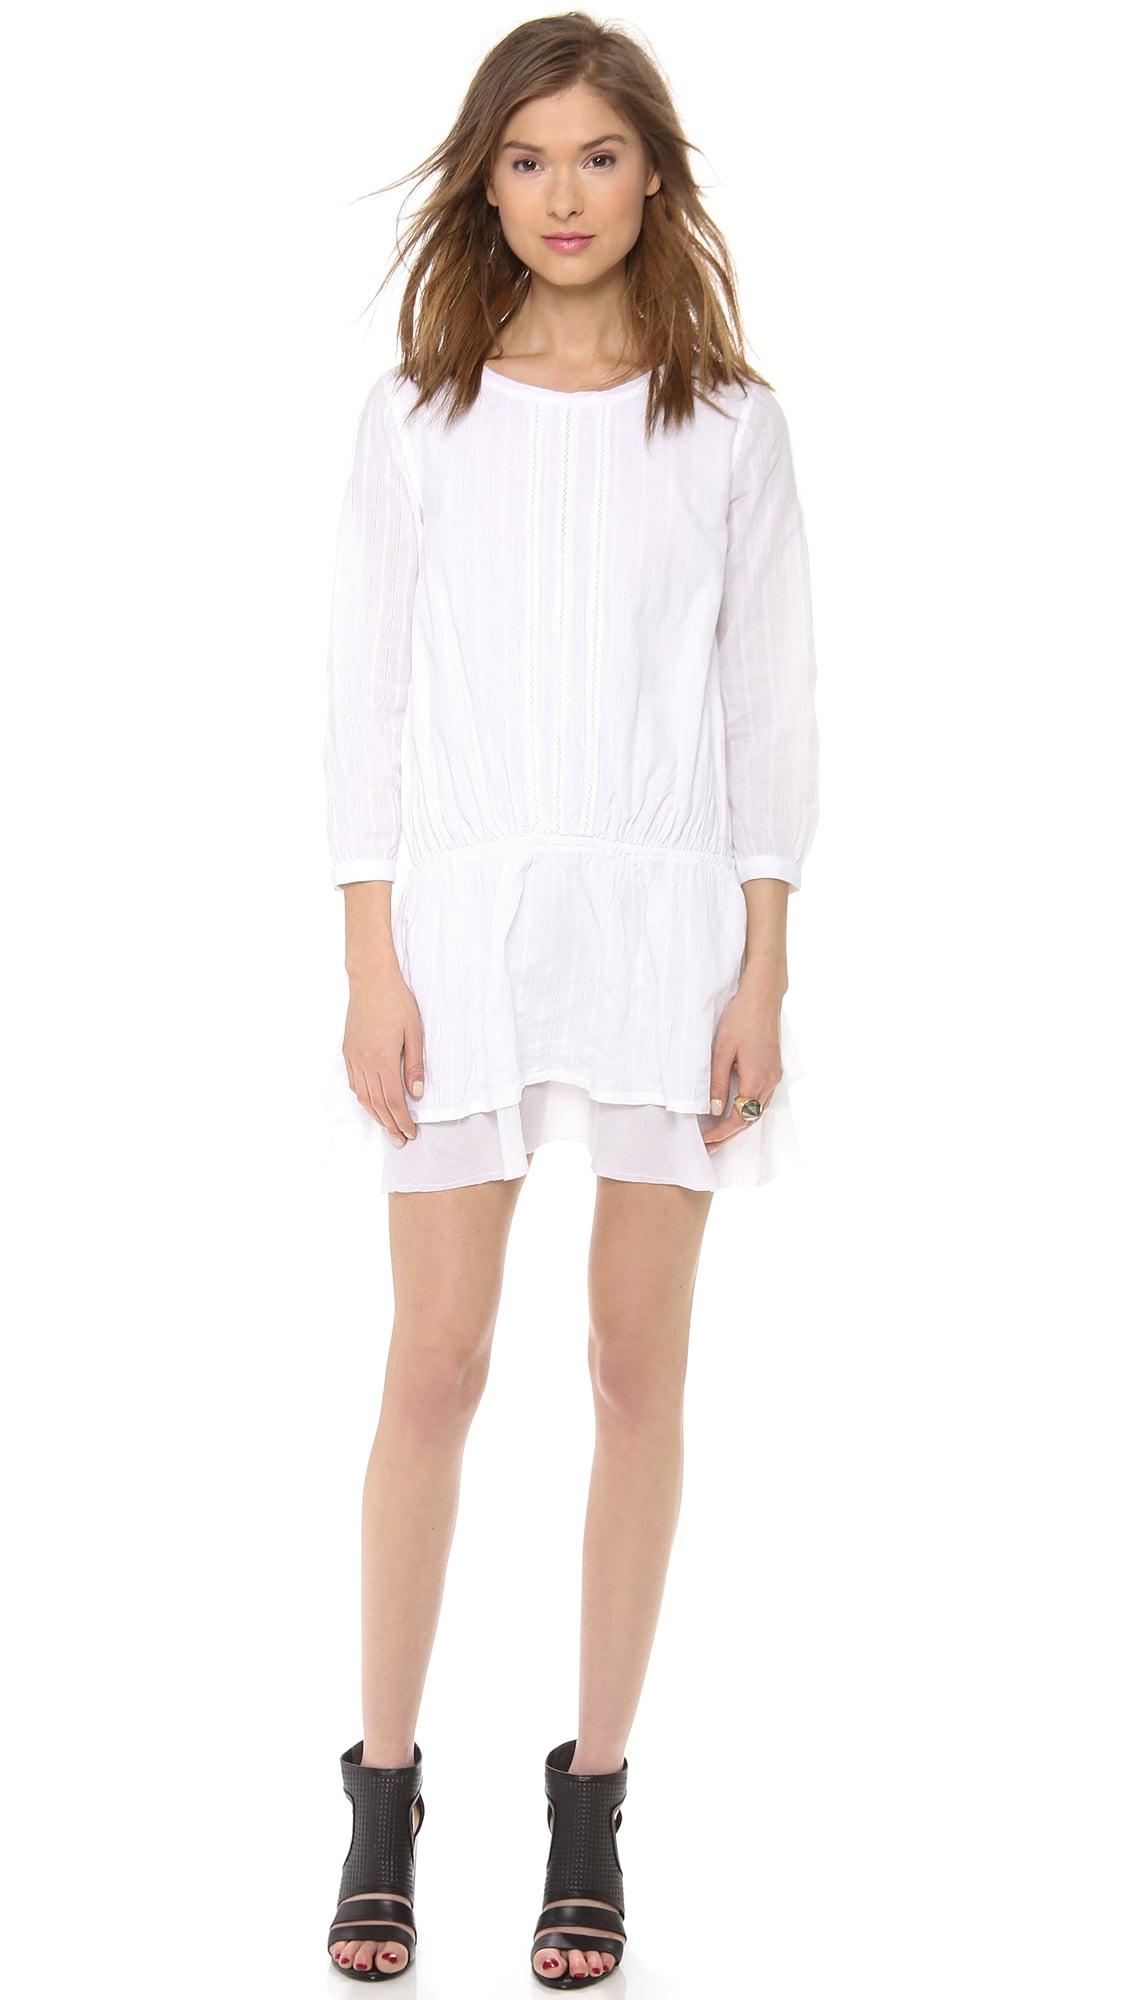 House of Harlow White Minidress